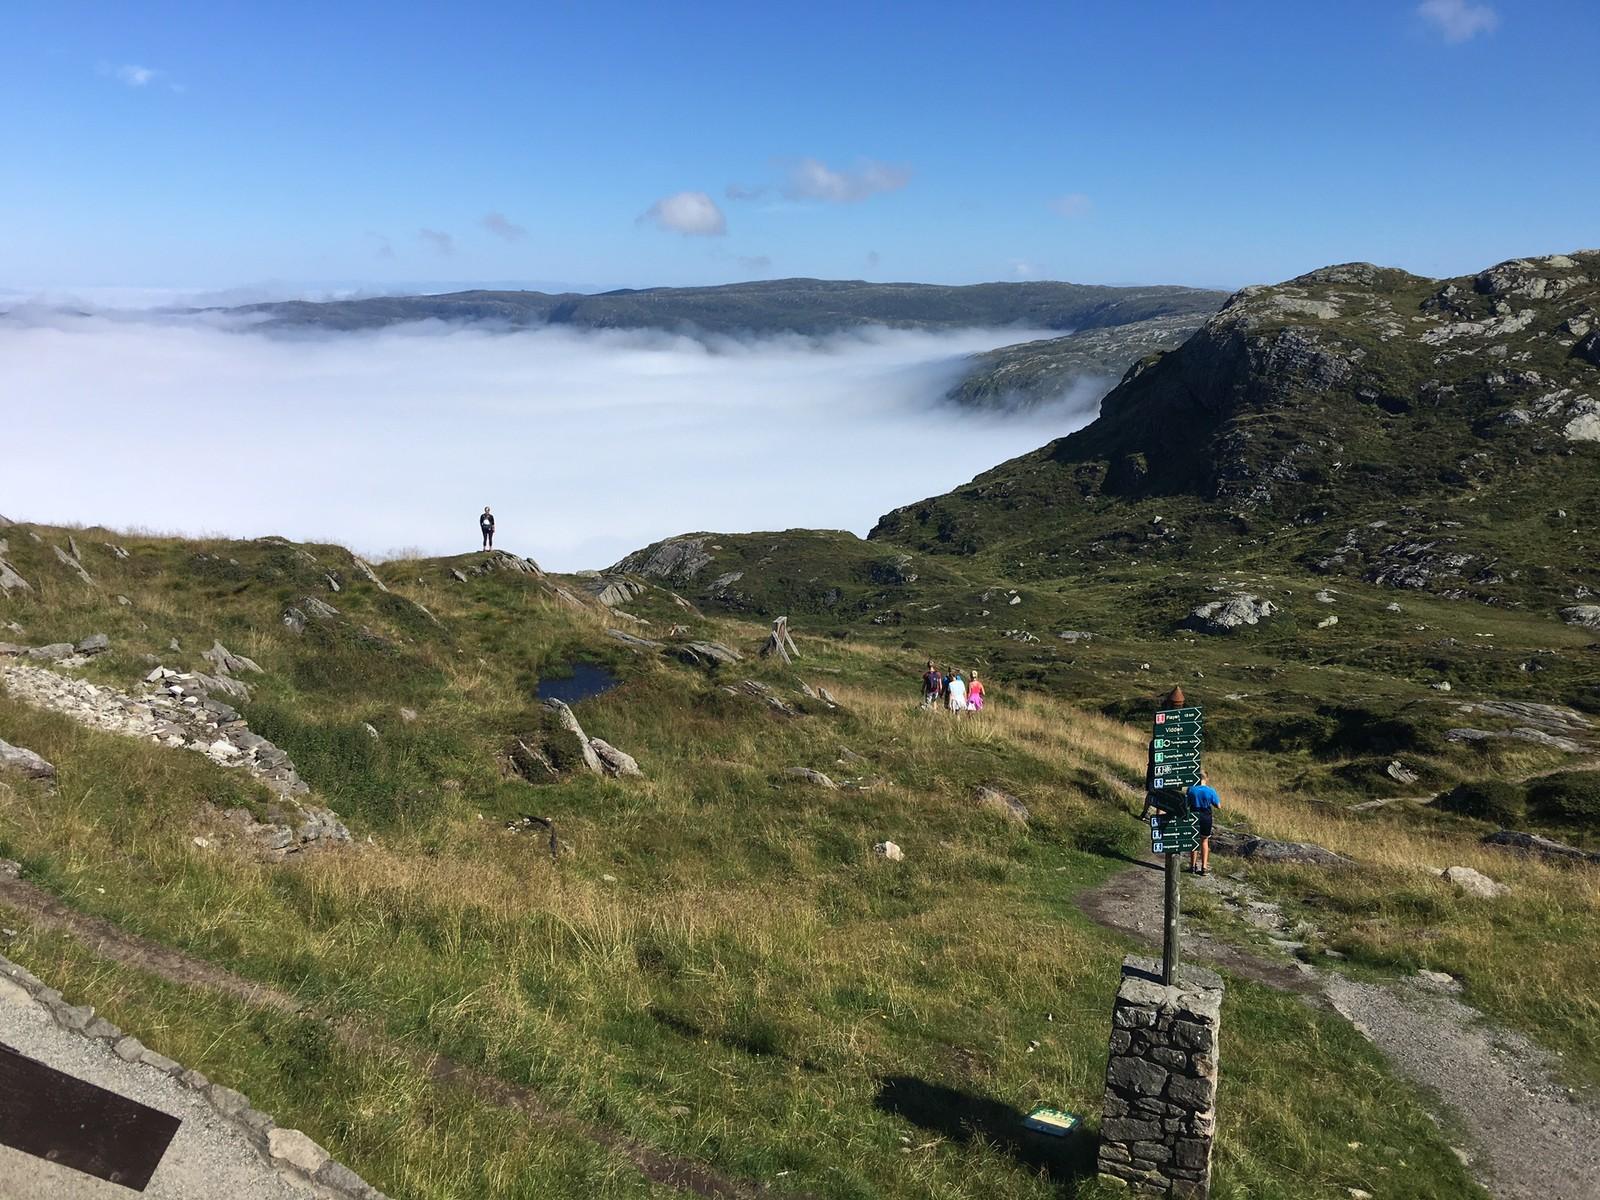 VIDDEN I SOL: Mens tåken lå over Bergen, badet Vidden i strålende formiddagssol.